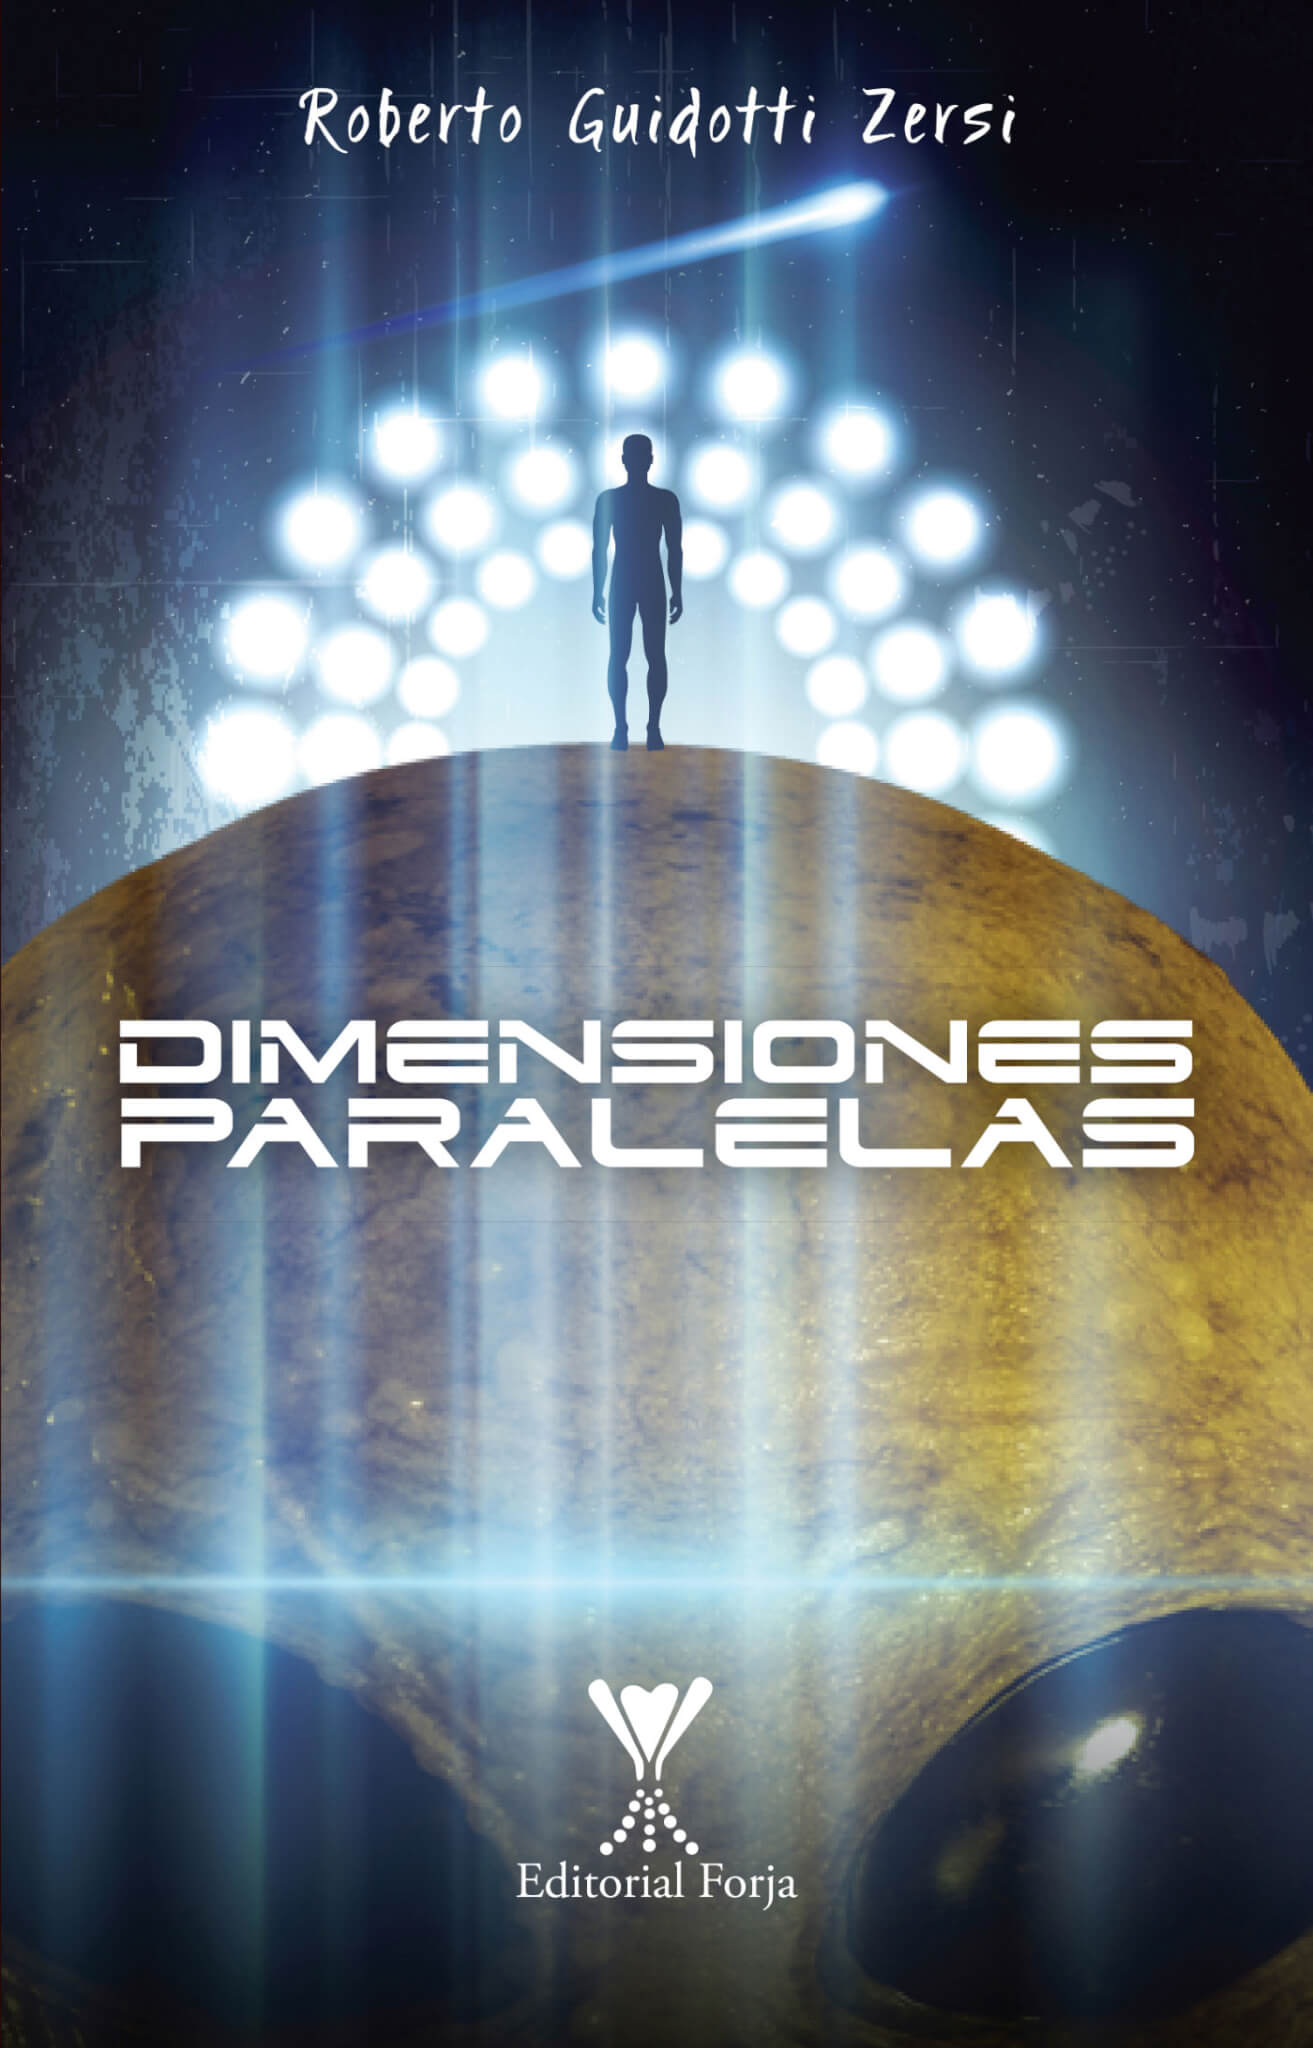 Dimensiones paralelas